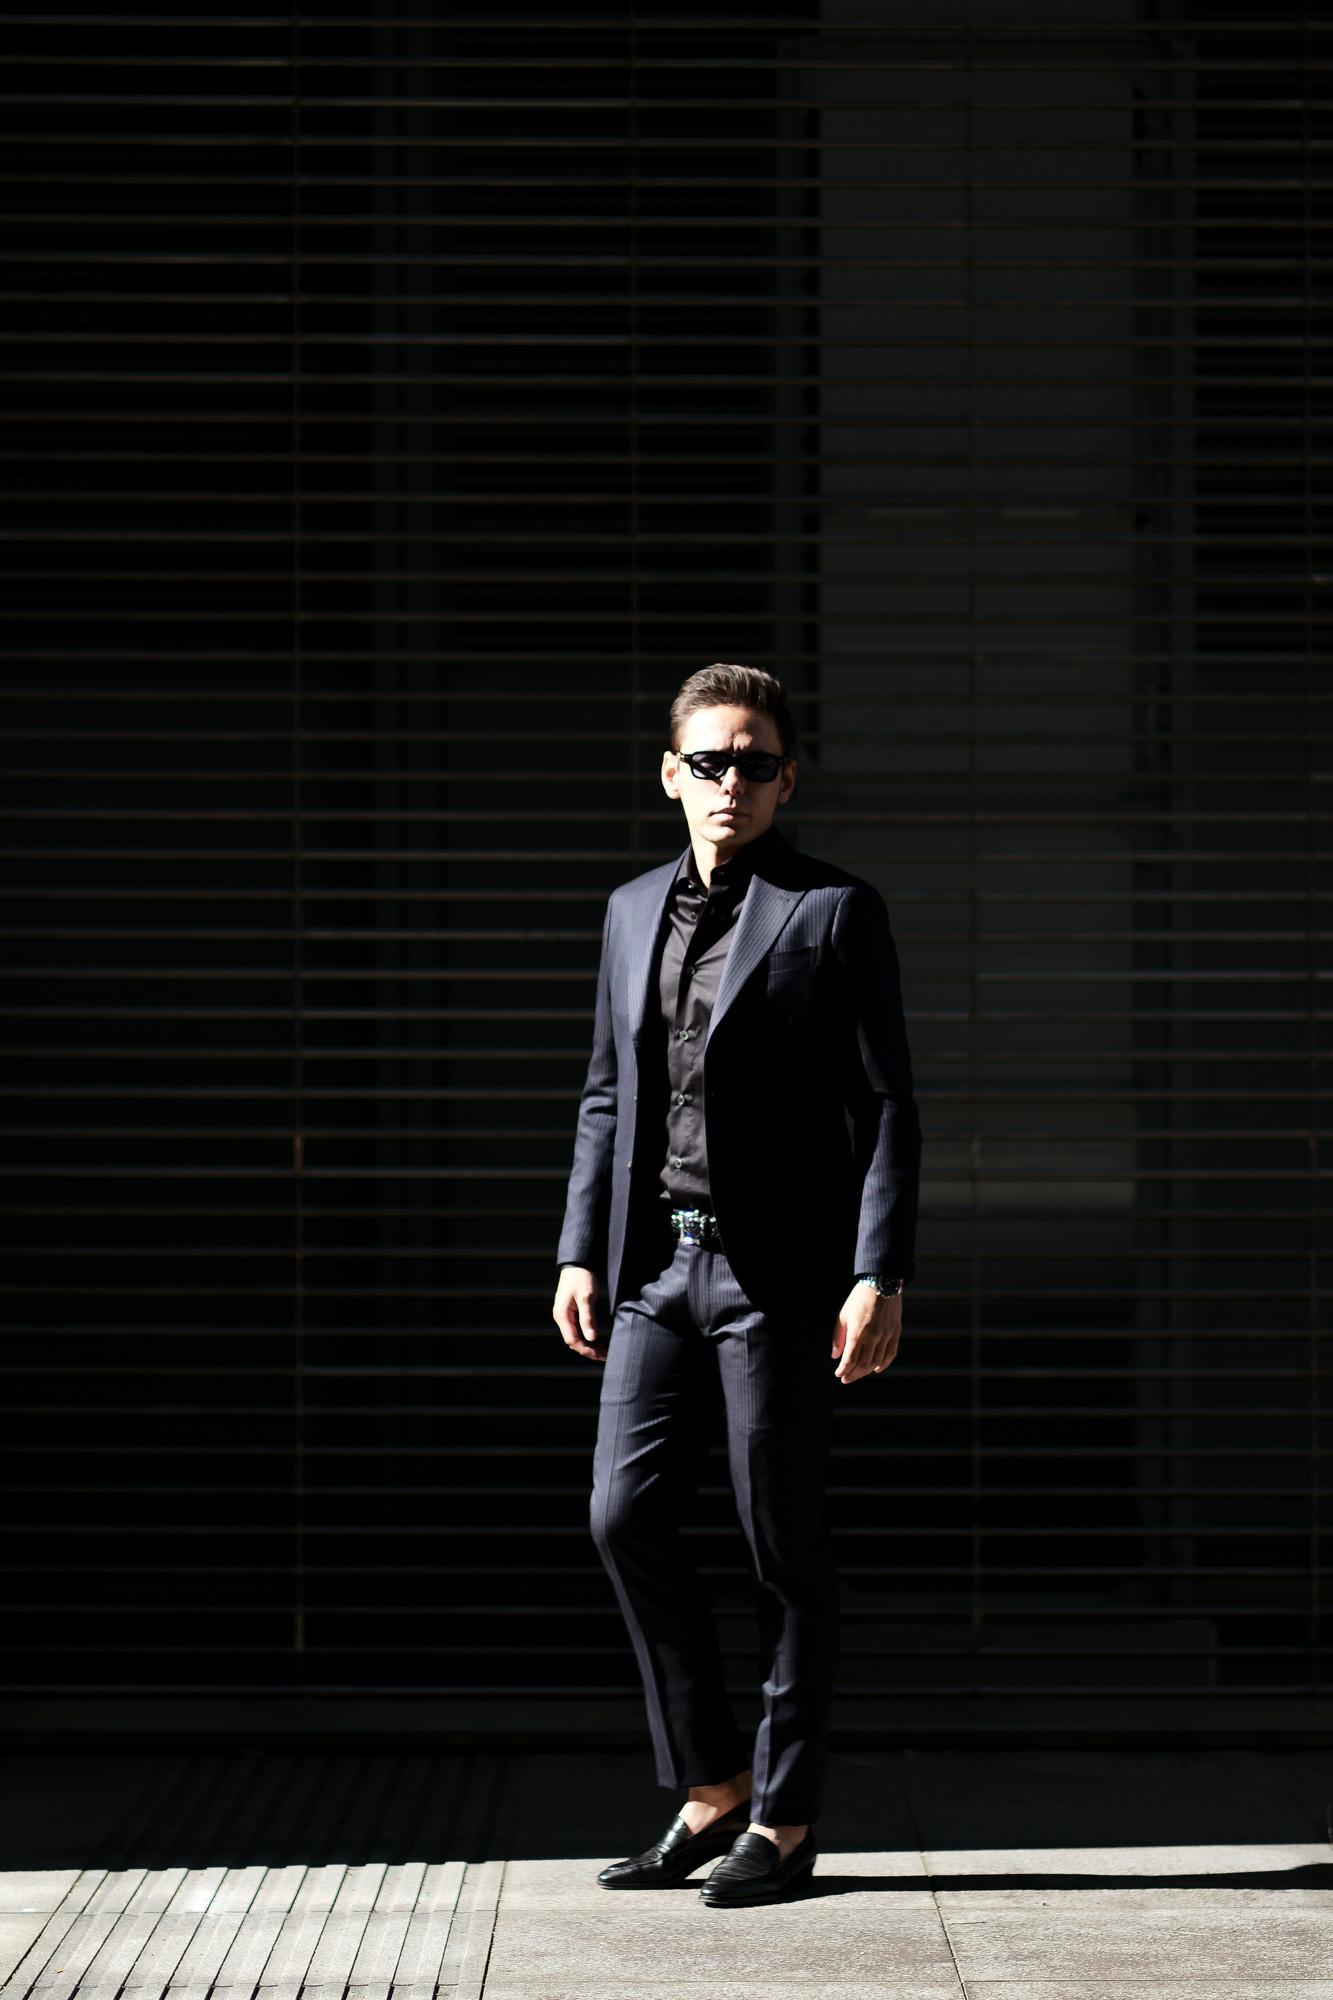 cuervo bopoha(クエルボ ヴァローナ) Sartoria Collection (サルトリア コレクション) Rooster (ルースター) LANVIN (ランバン) ストライプ スーツ NAVY (ネイビー) MADE IN JAPAN (日本製) 2020 【ご予約受付中】愛知 名古屋 altoediritto アルトエデリット オーダースーツ ゼニアスーツ